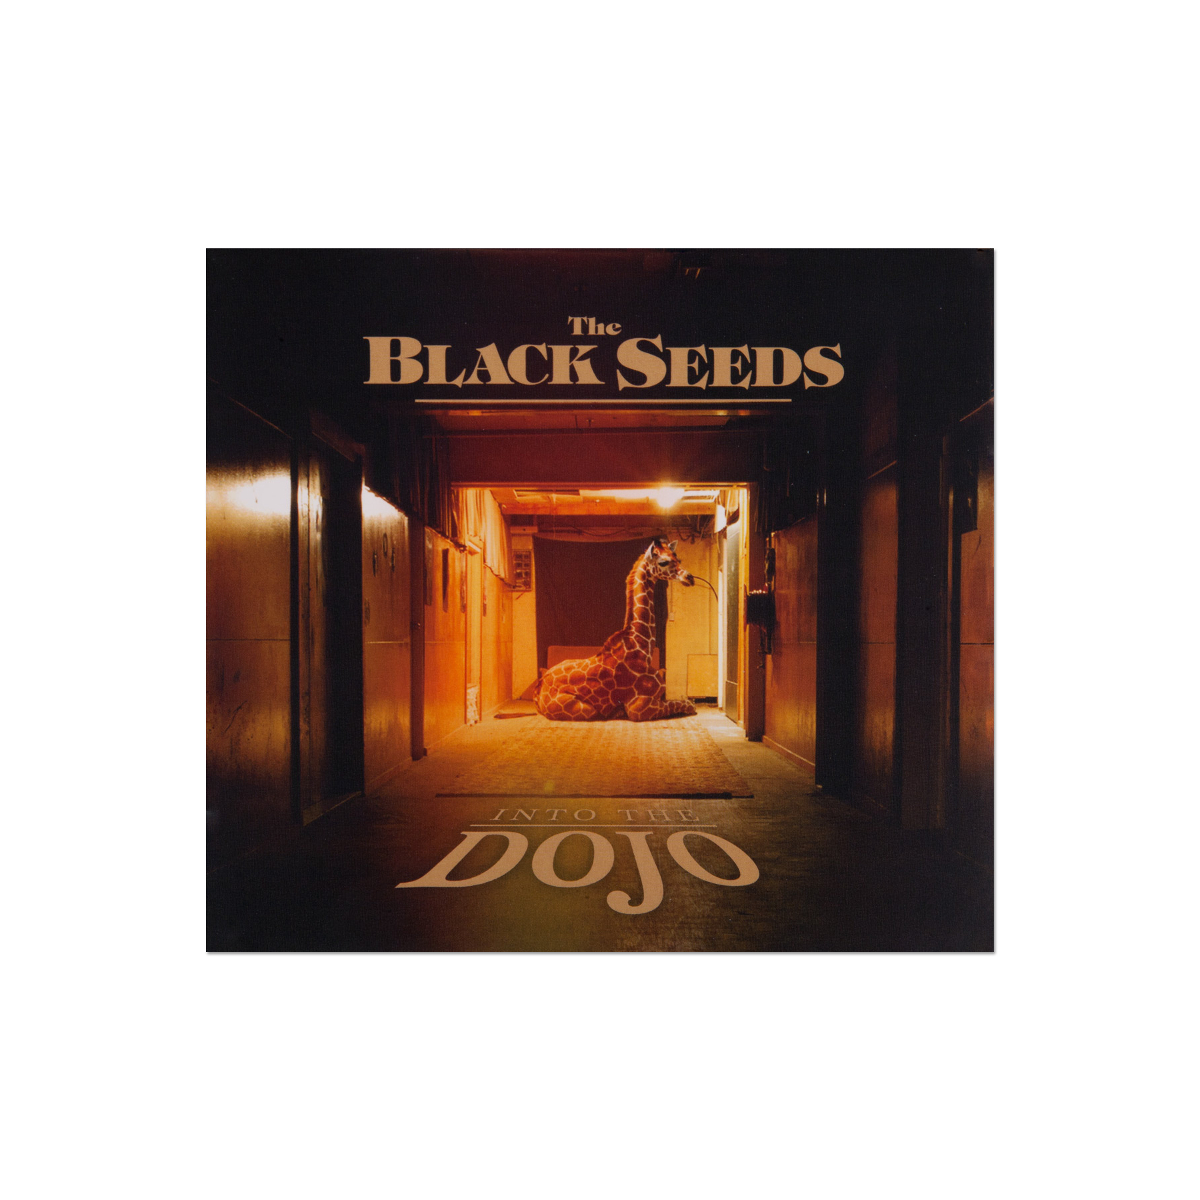 The Black Seeds - Into The Dojo Digital Download